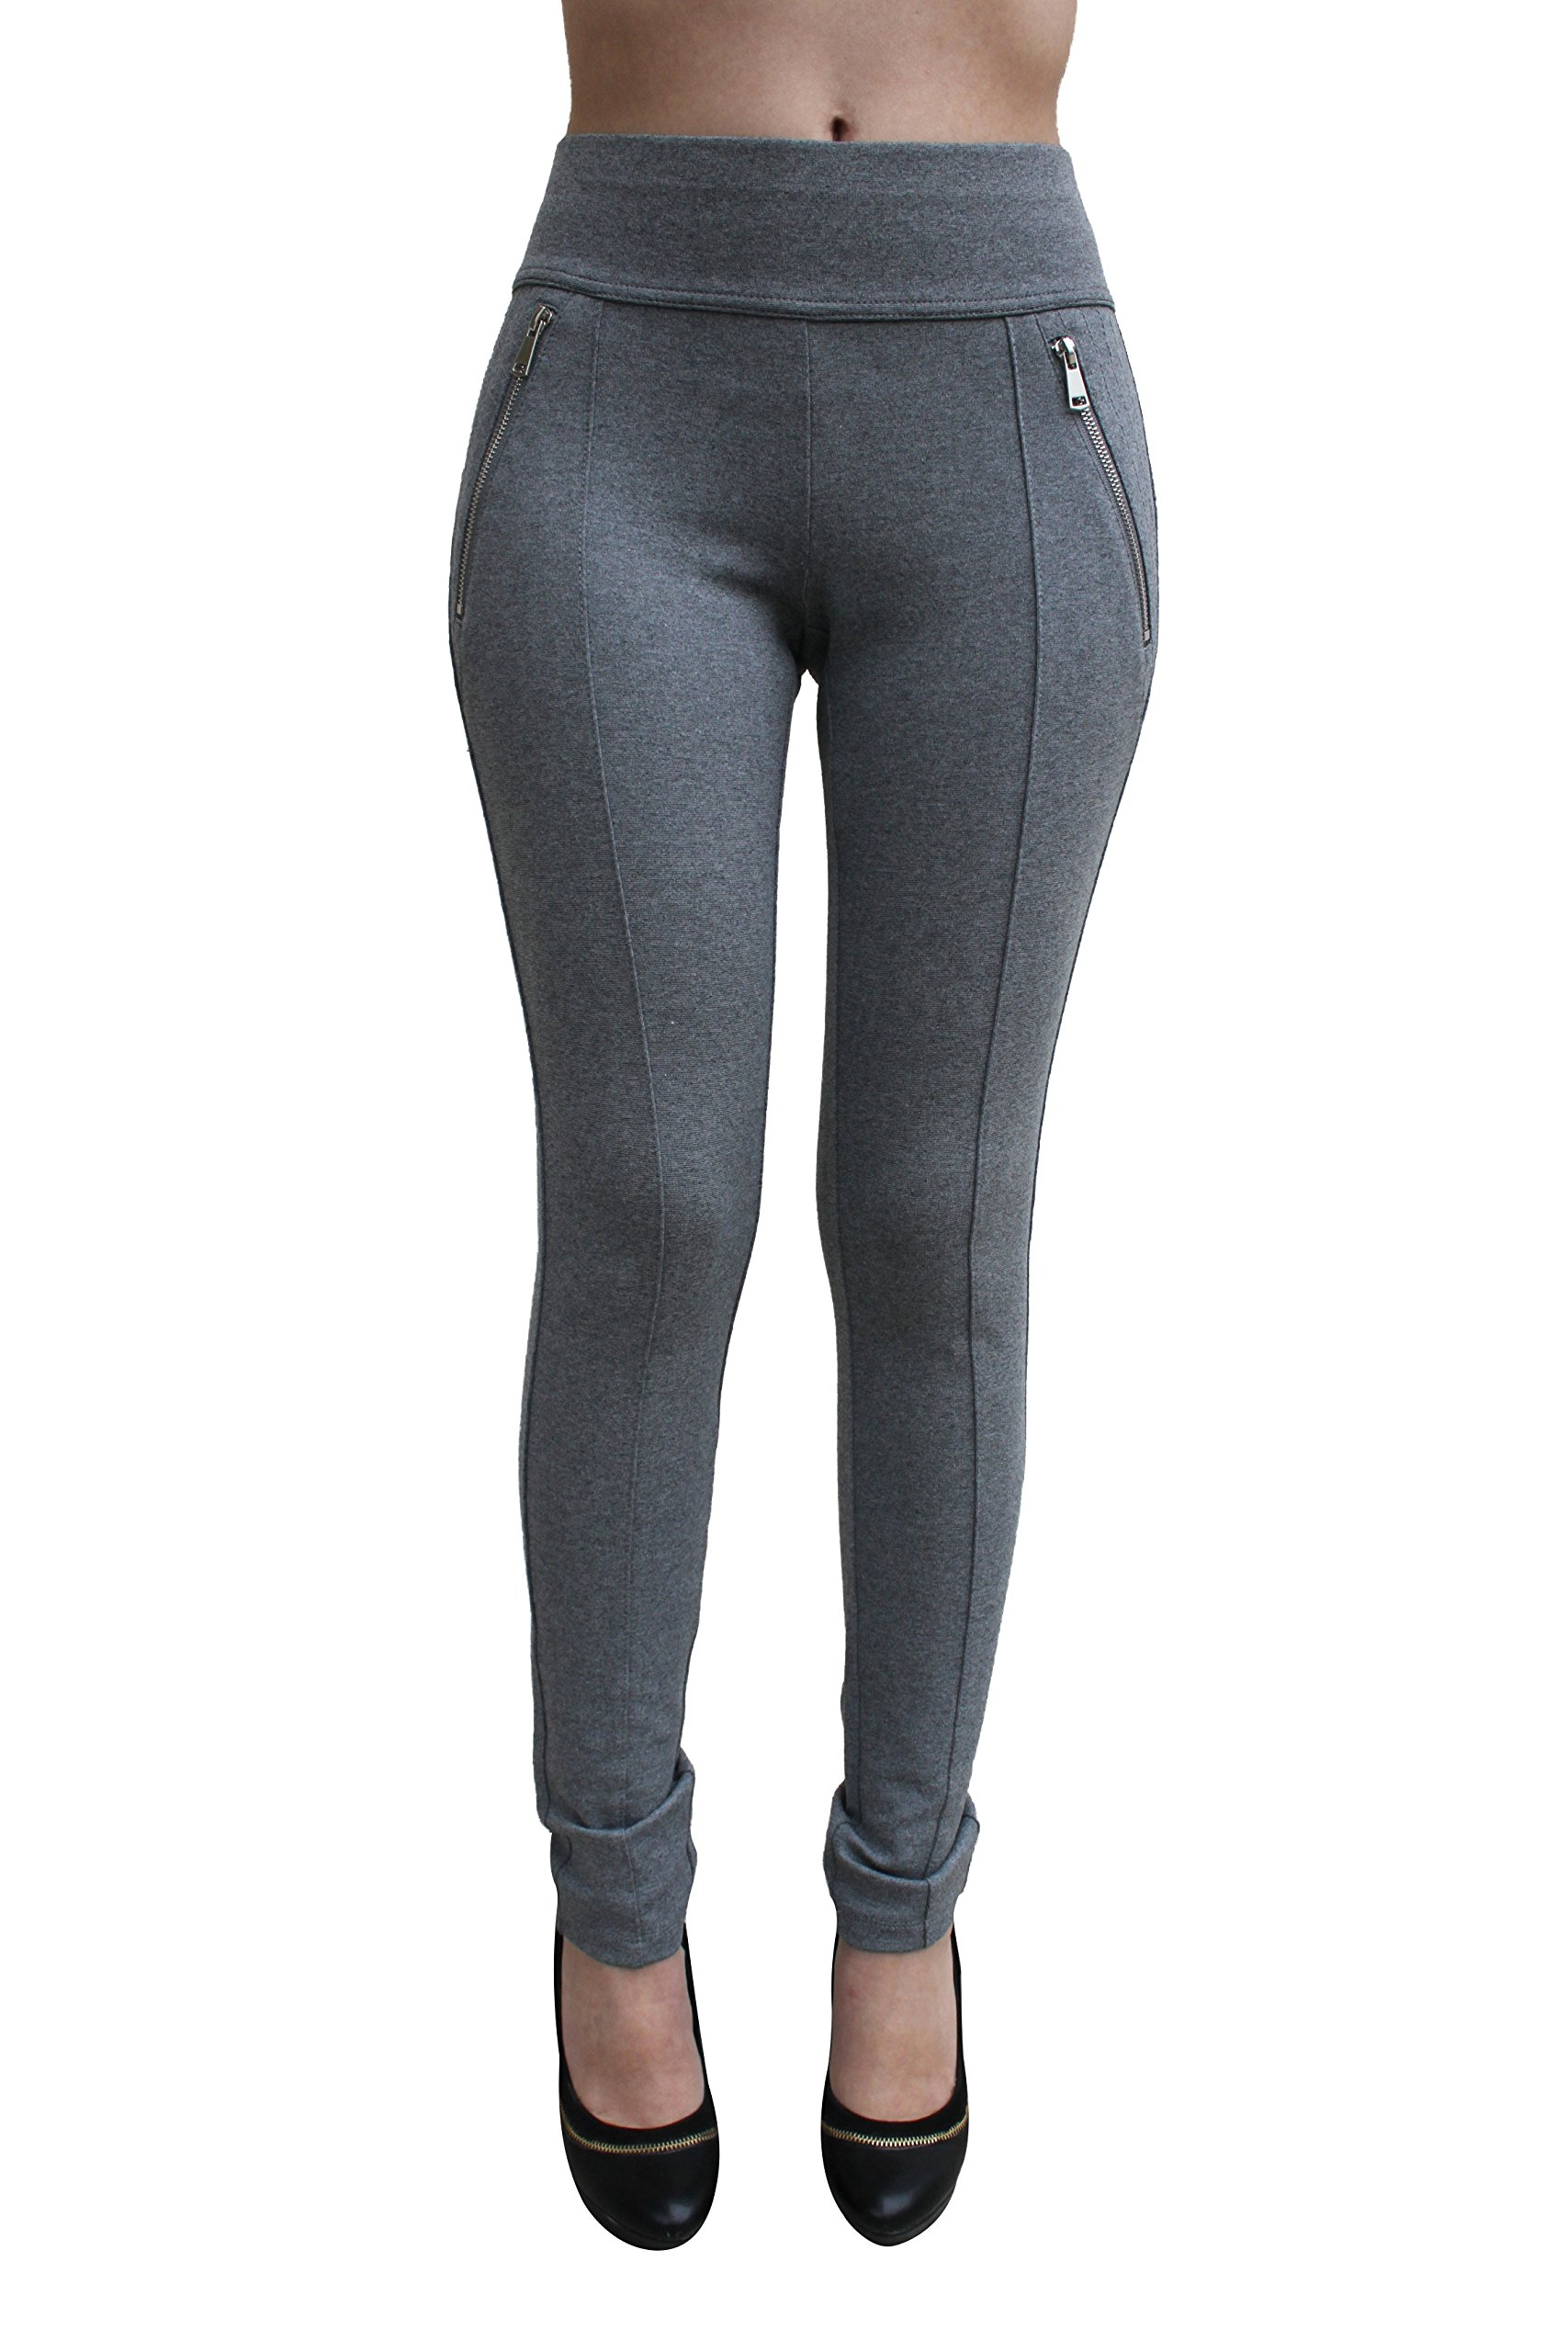 Ci Sono High Waist Legging with Zipper PP51 (Large, Grey)